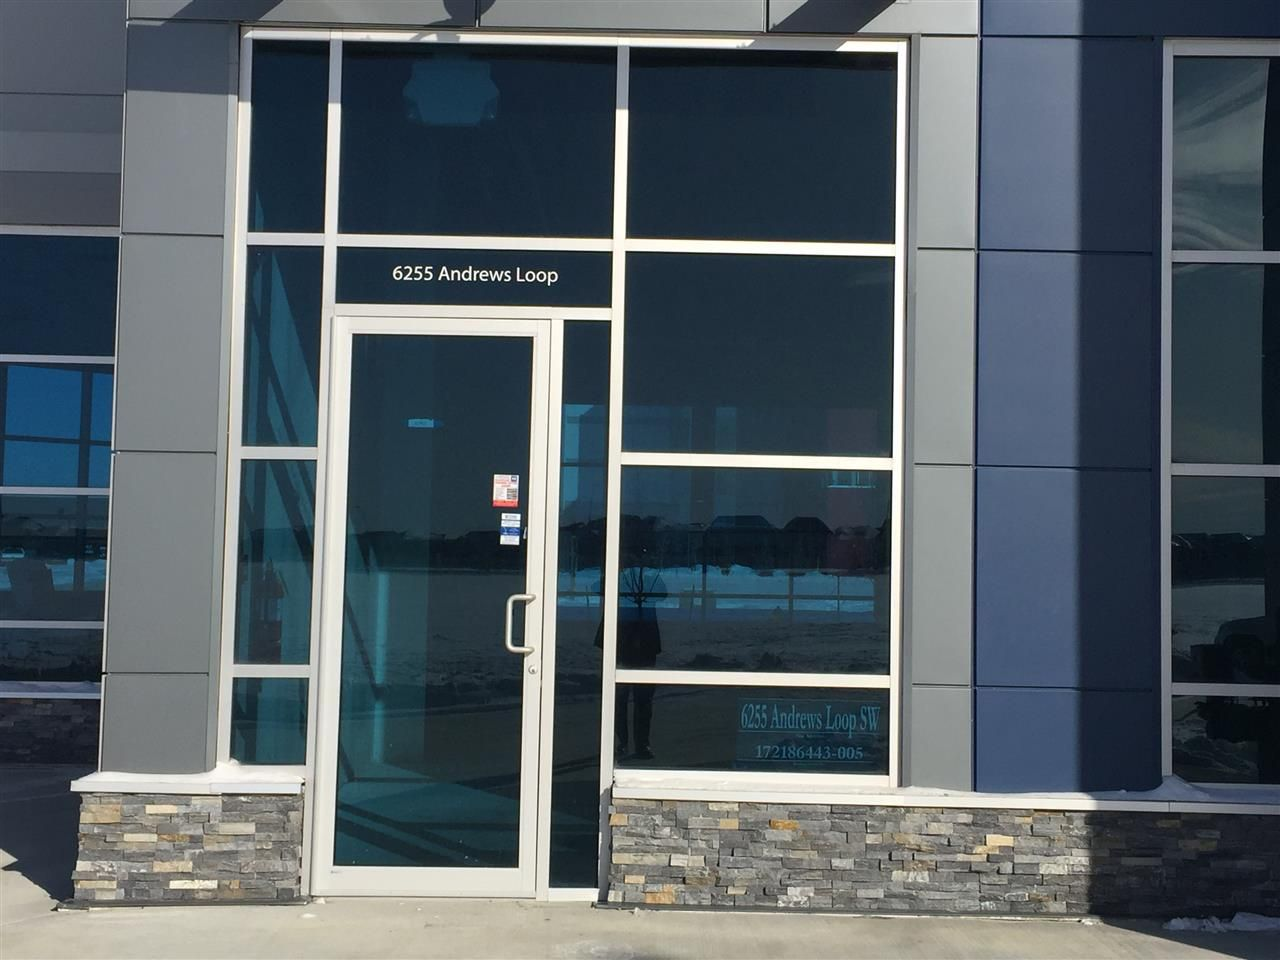 Main Photo: 102 6255 Andrews Loop in Edmonton: Zone 56 Retail for lease : MLS®# E4096619